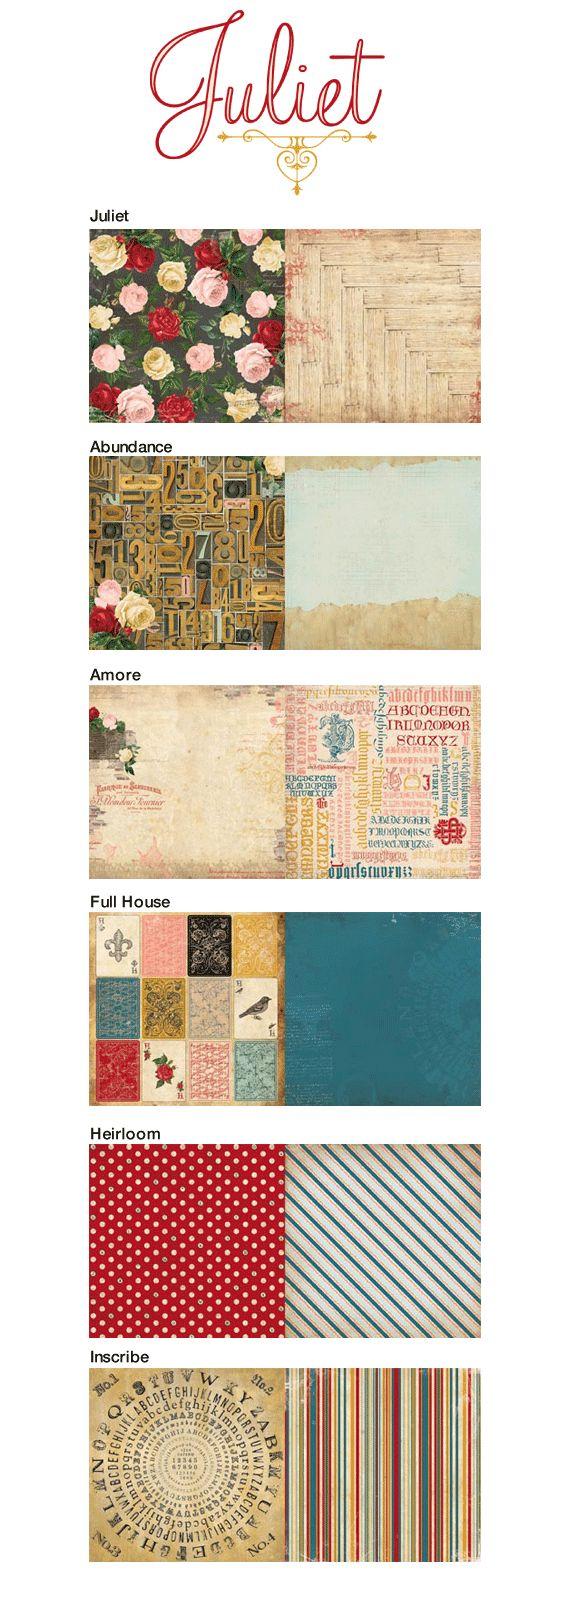 Juliet scrapbook ideas - Bobunny S Newest Collection Juliet